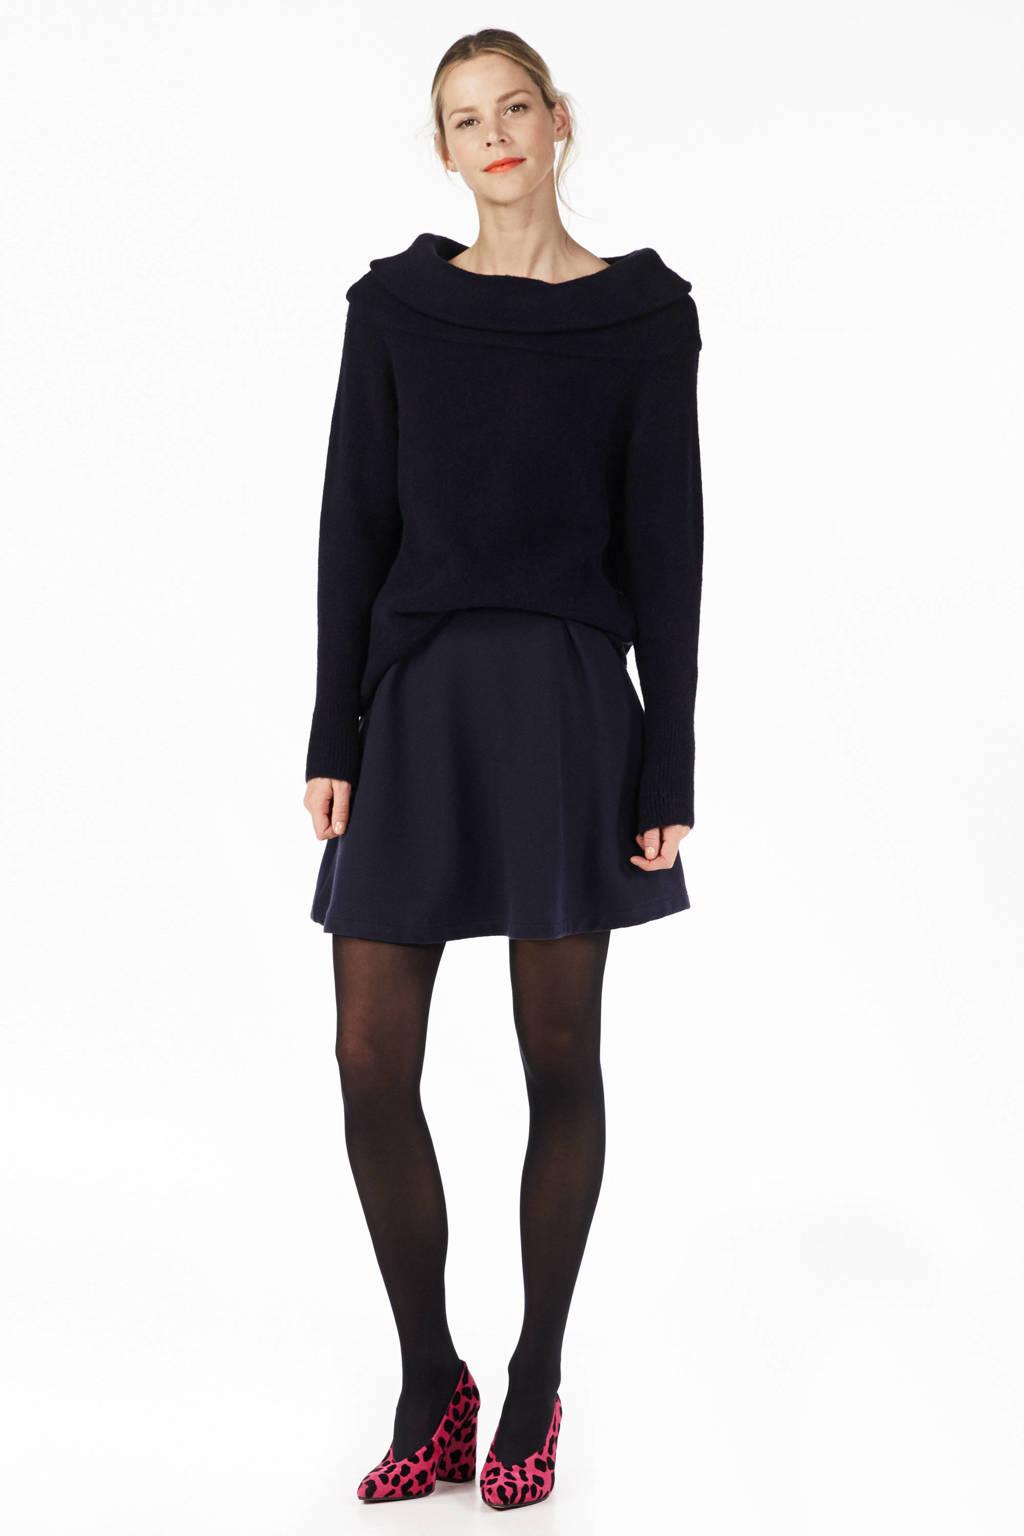 whkmp's own trui, Donkerblauw